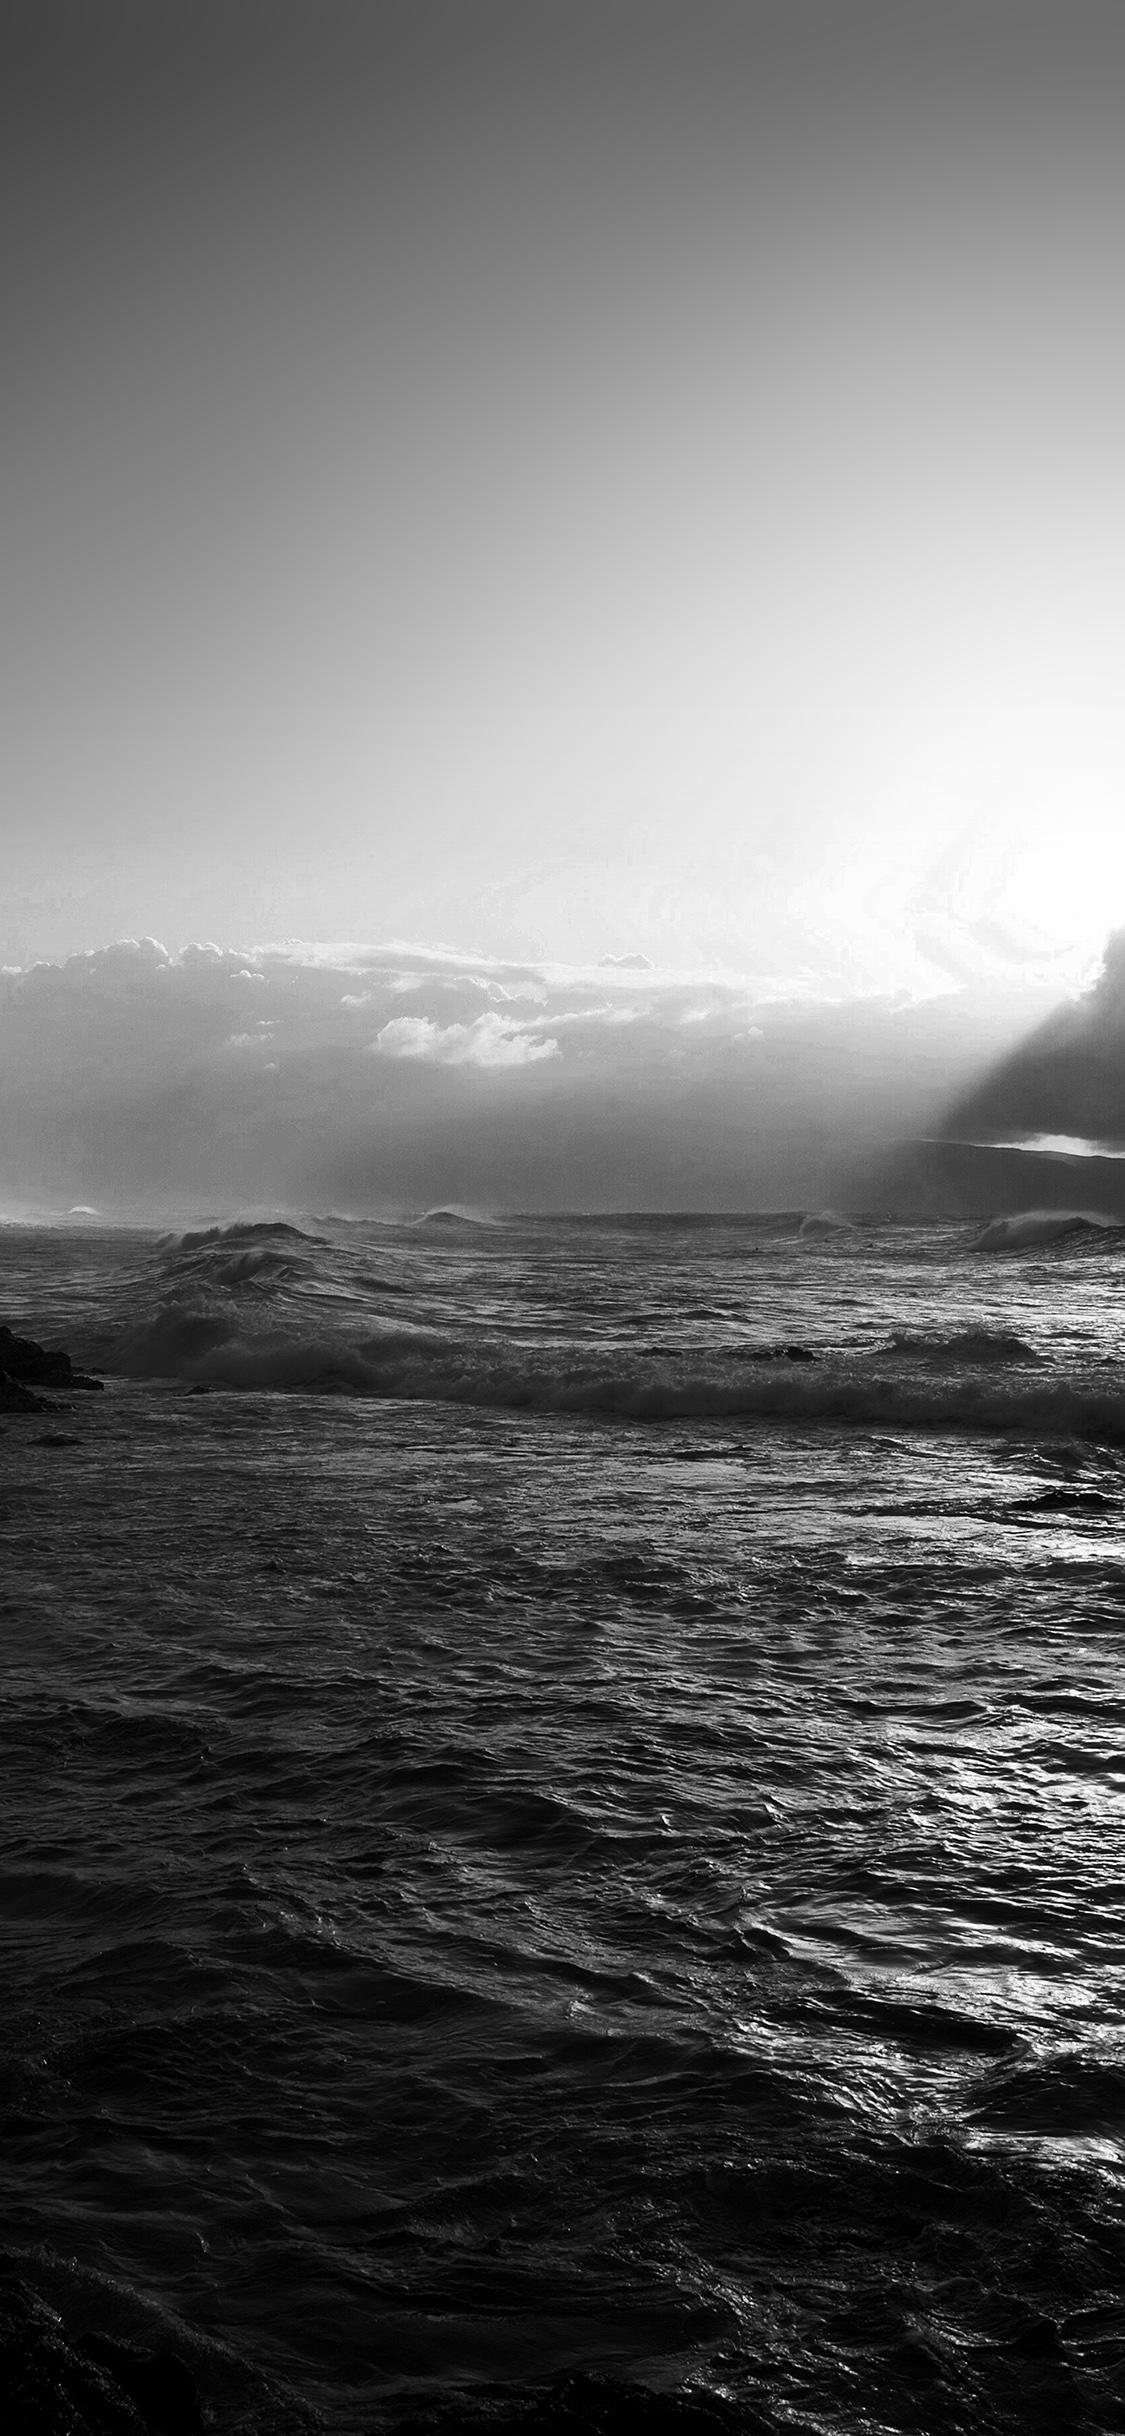 iPhonexpapers.com-Apple-iPhone-wallpaper-mz91-sea-ocean-rock-nature-wave-sky-bw-dark